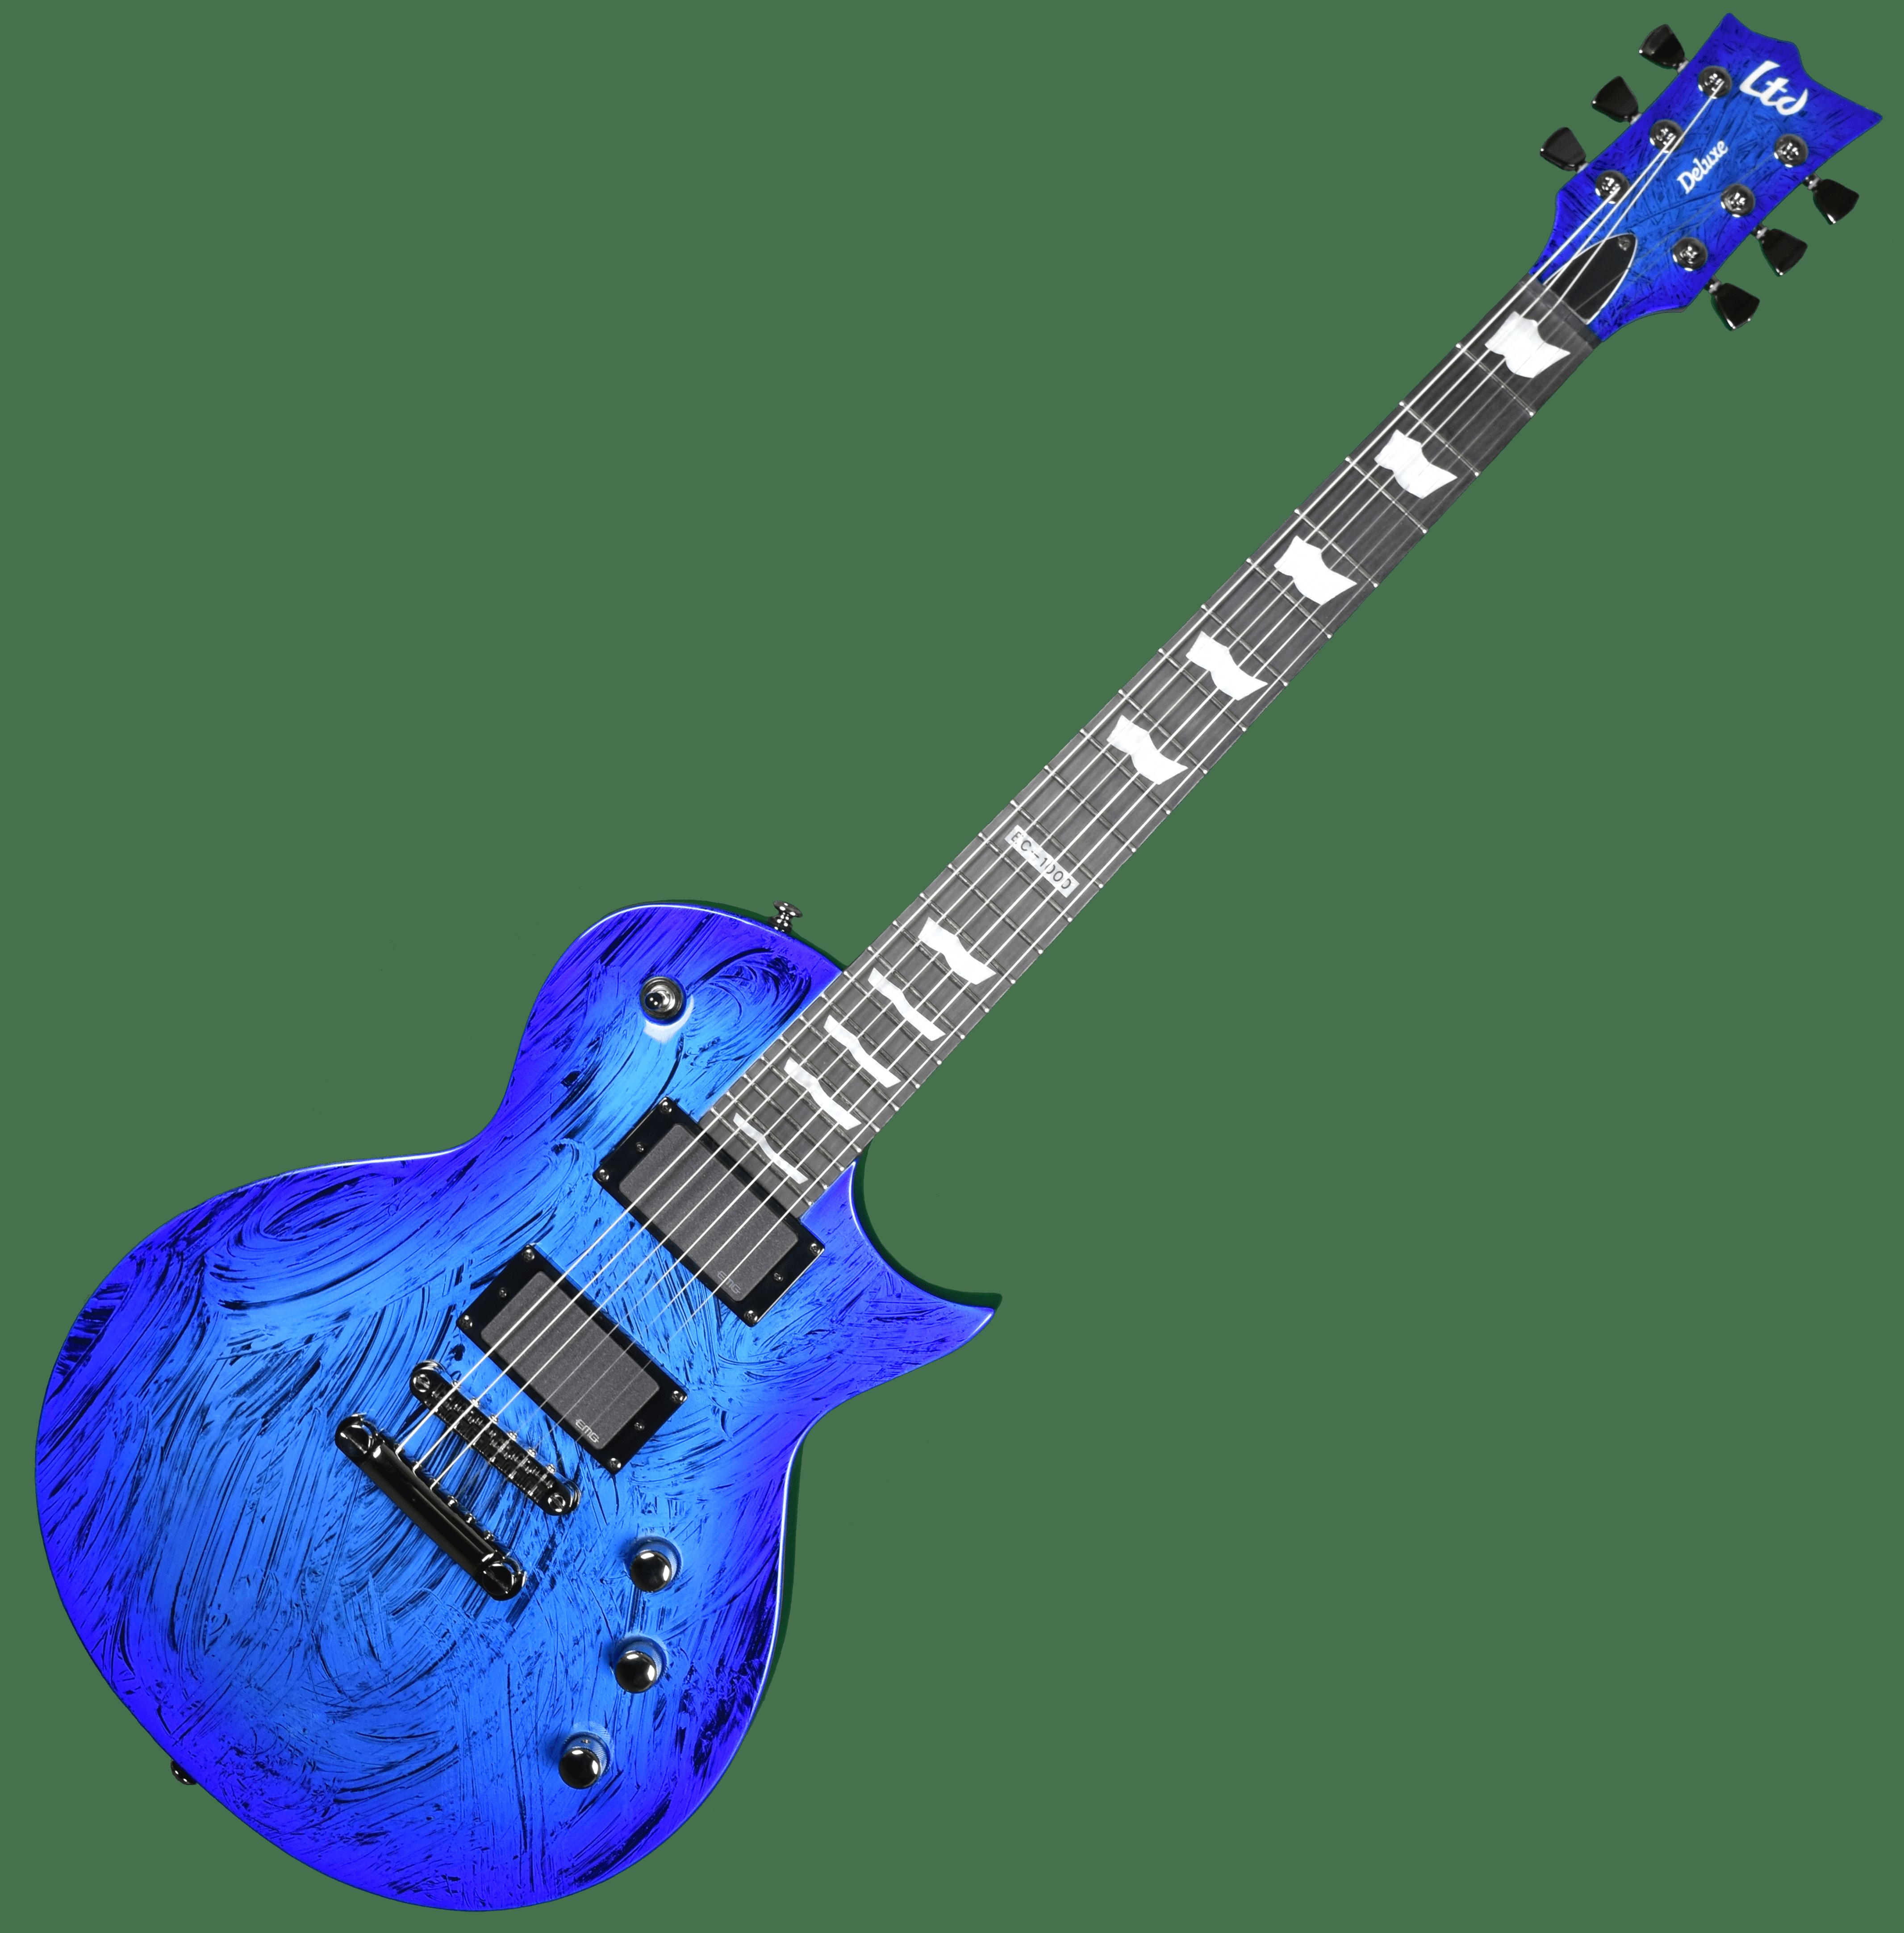 esp ltd deluxe ec 1000 electric guitar in swirl blue finish ec 1000. Black Bedroom Furniture Sets. Home Design Ideas